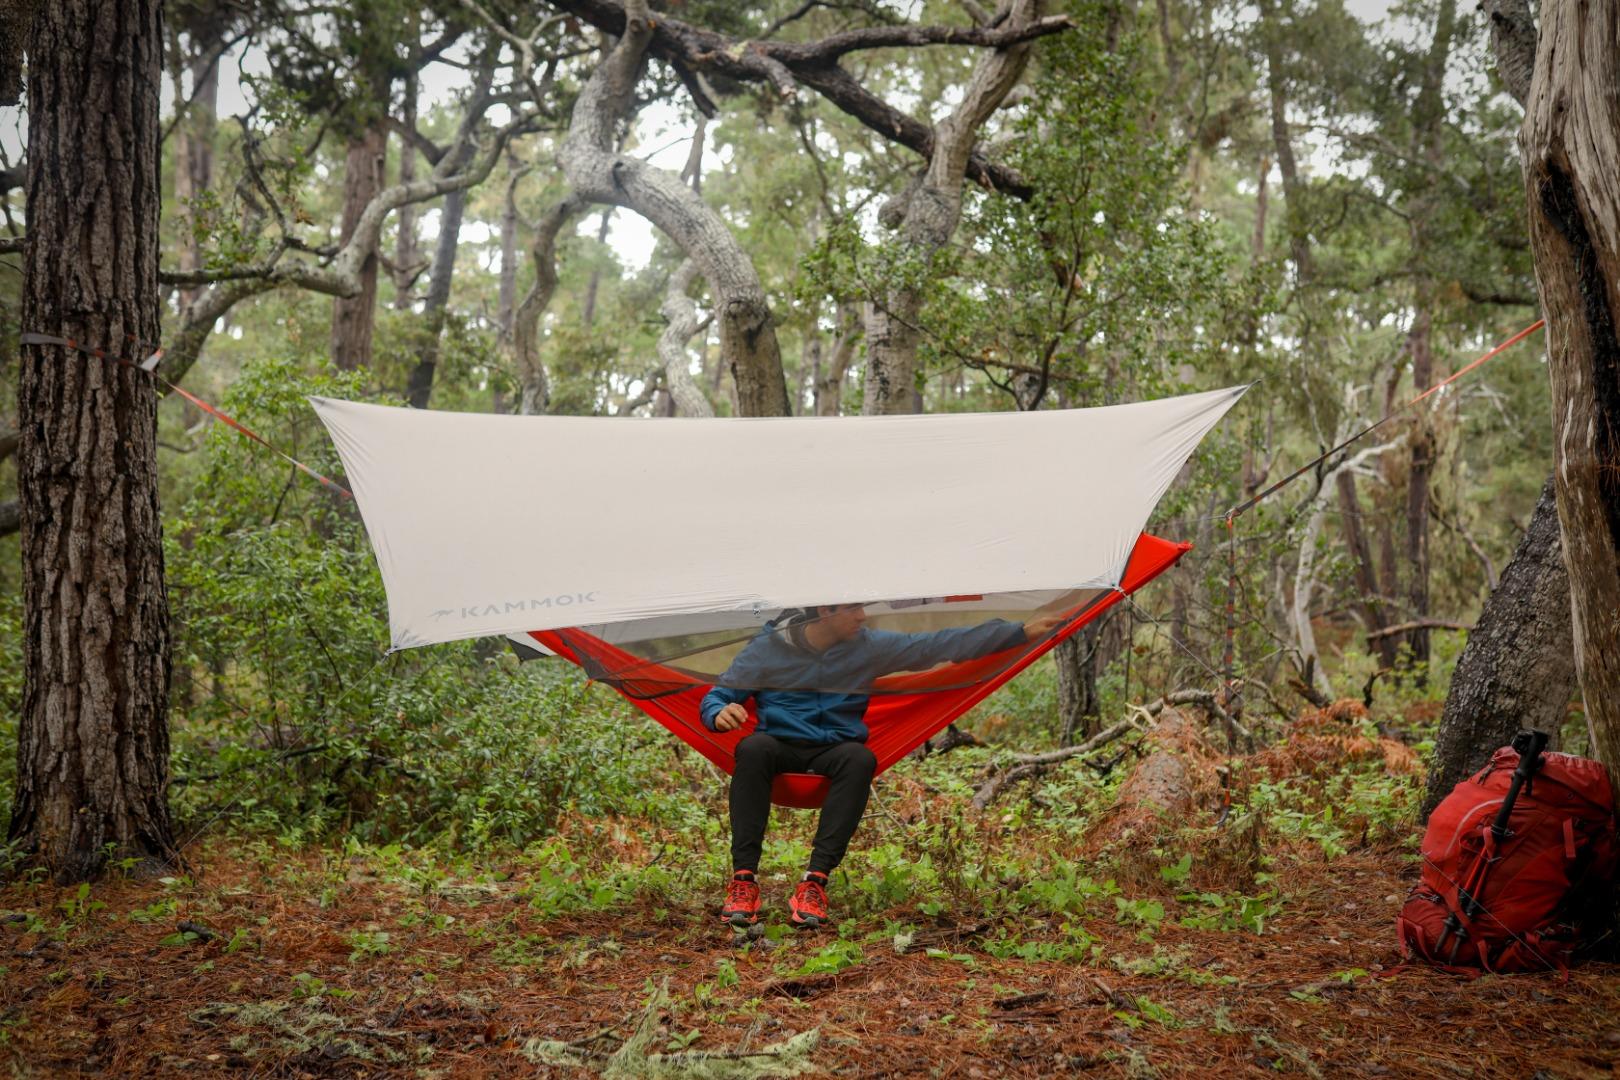 Ultralight Mantis hiking hammock is a one-kilogram tent killer